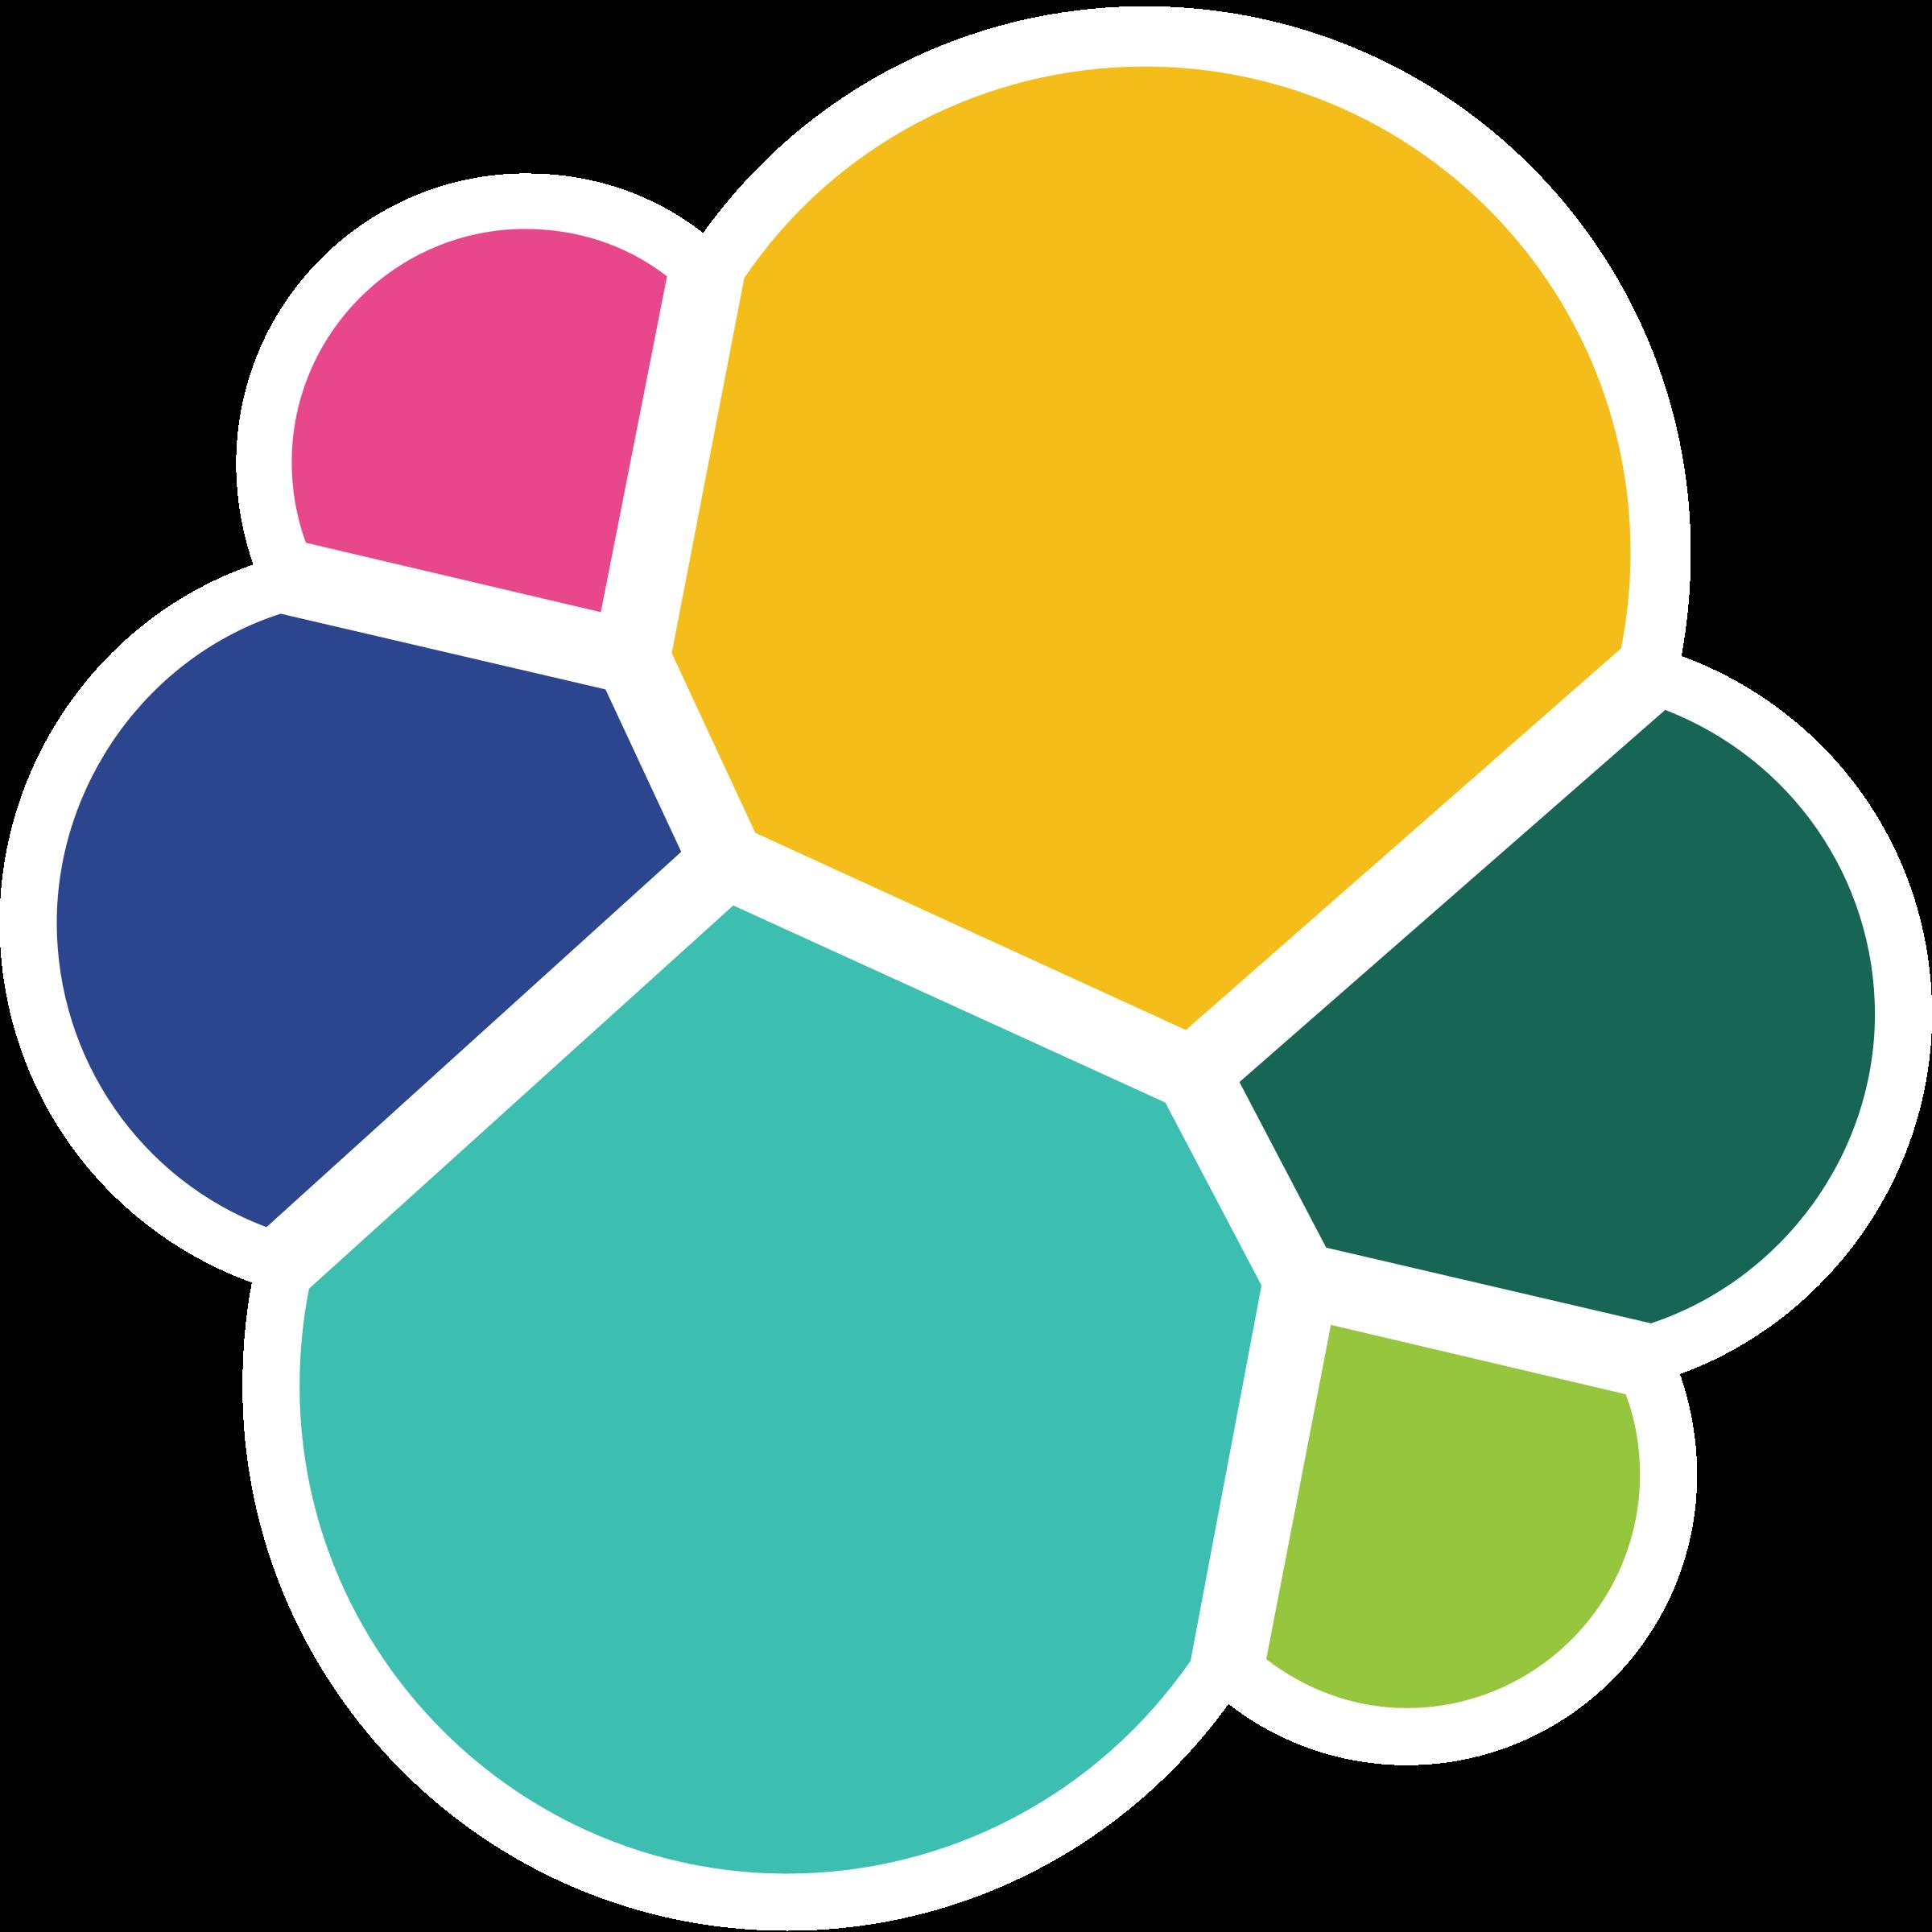 Elasticsearch Logo PNG Transparent & SVG Vector - Freebie ...